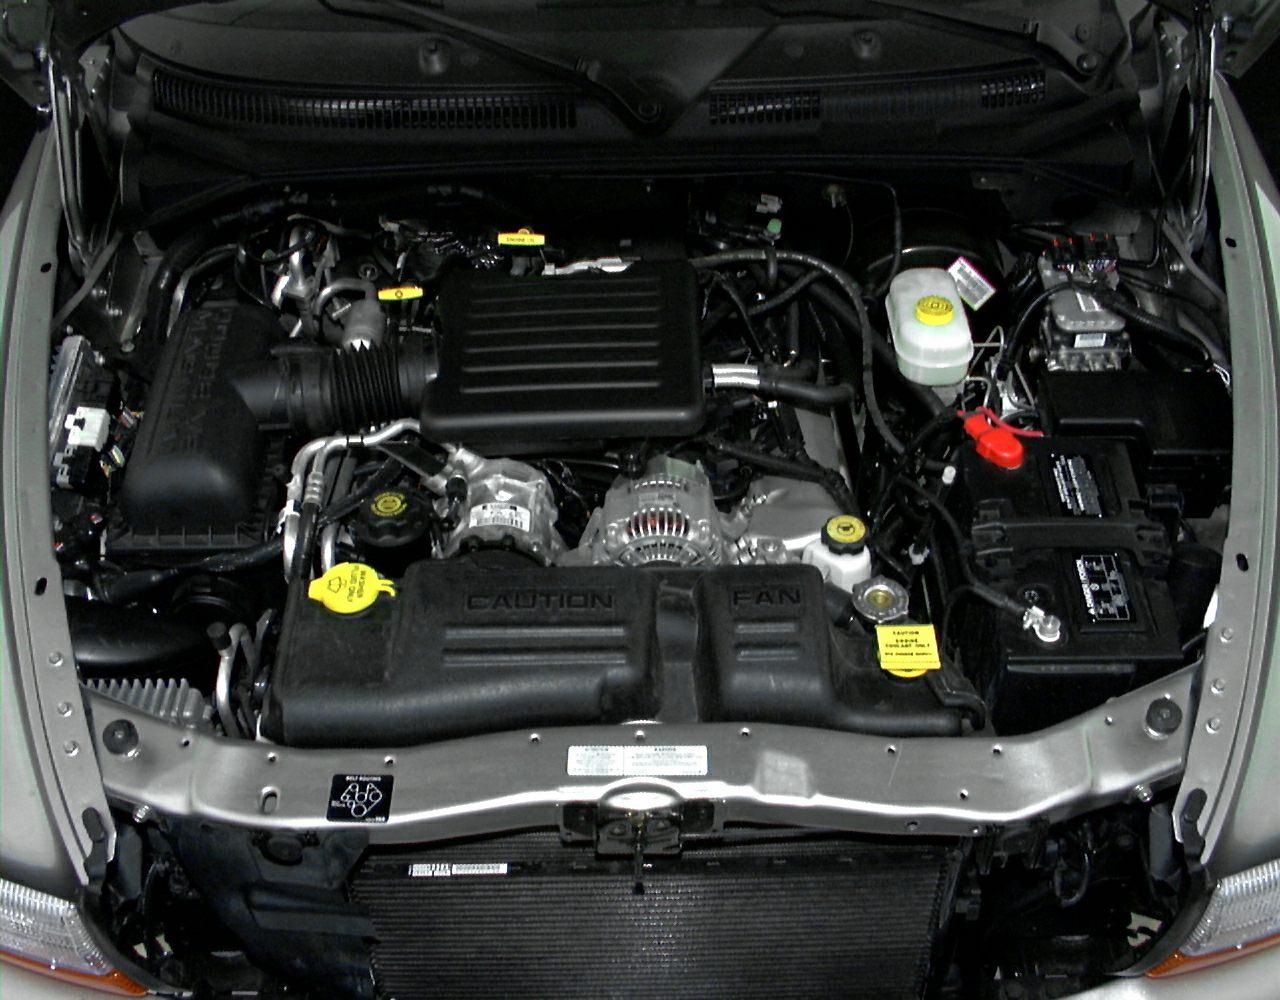 2000 Dodge Durango Exterior Photo